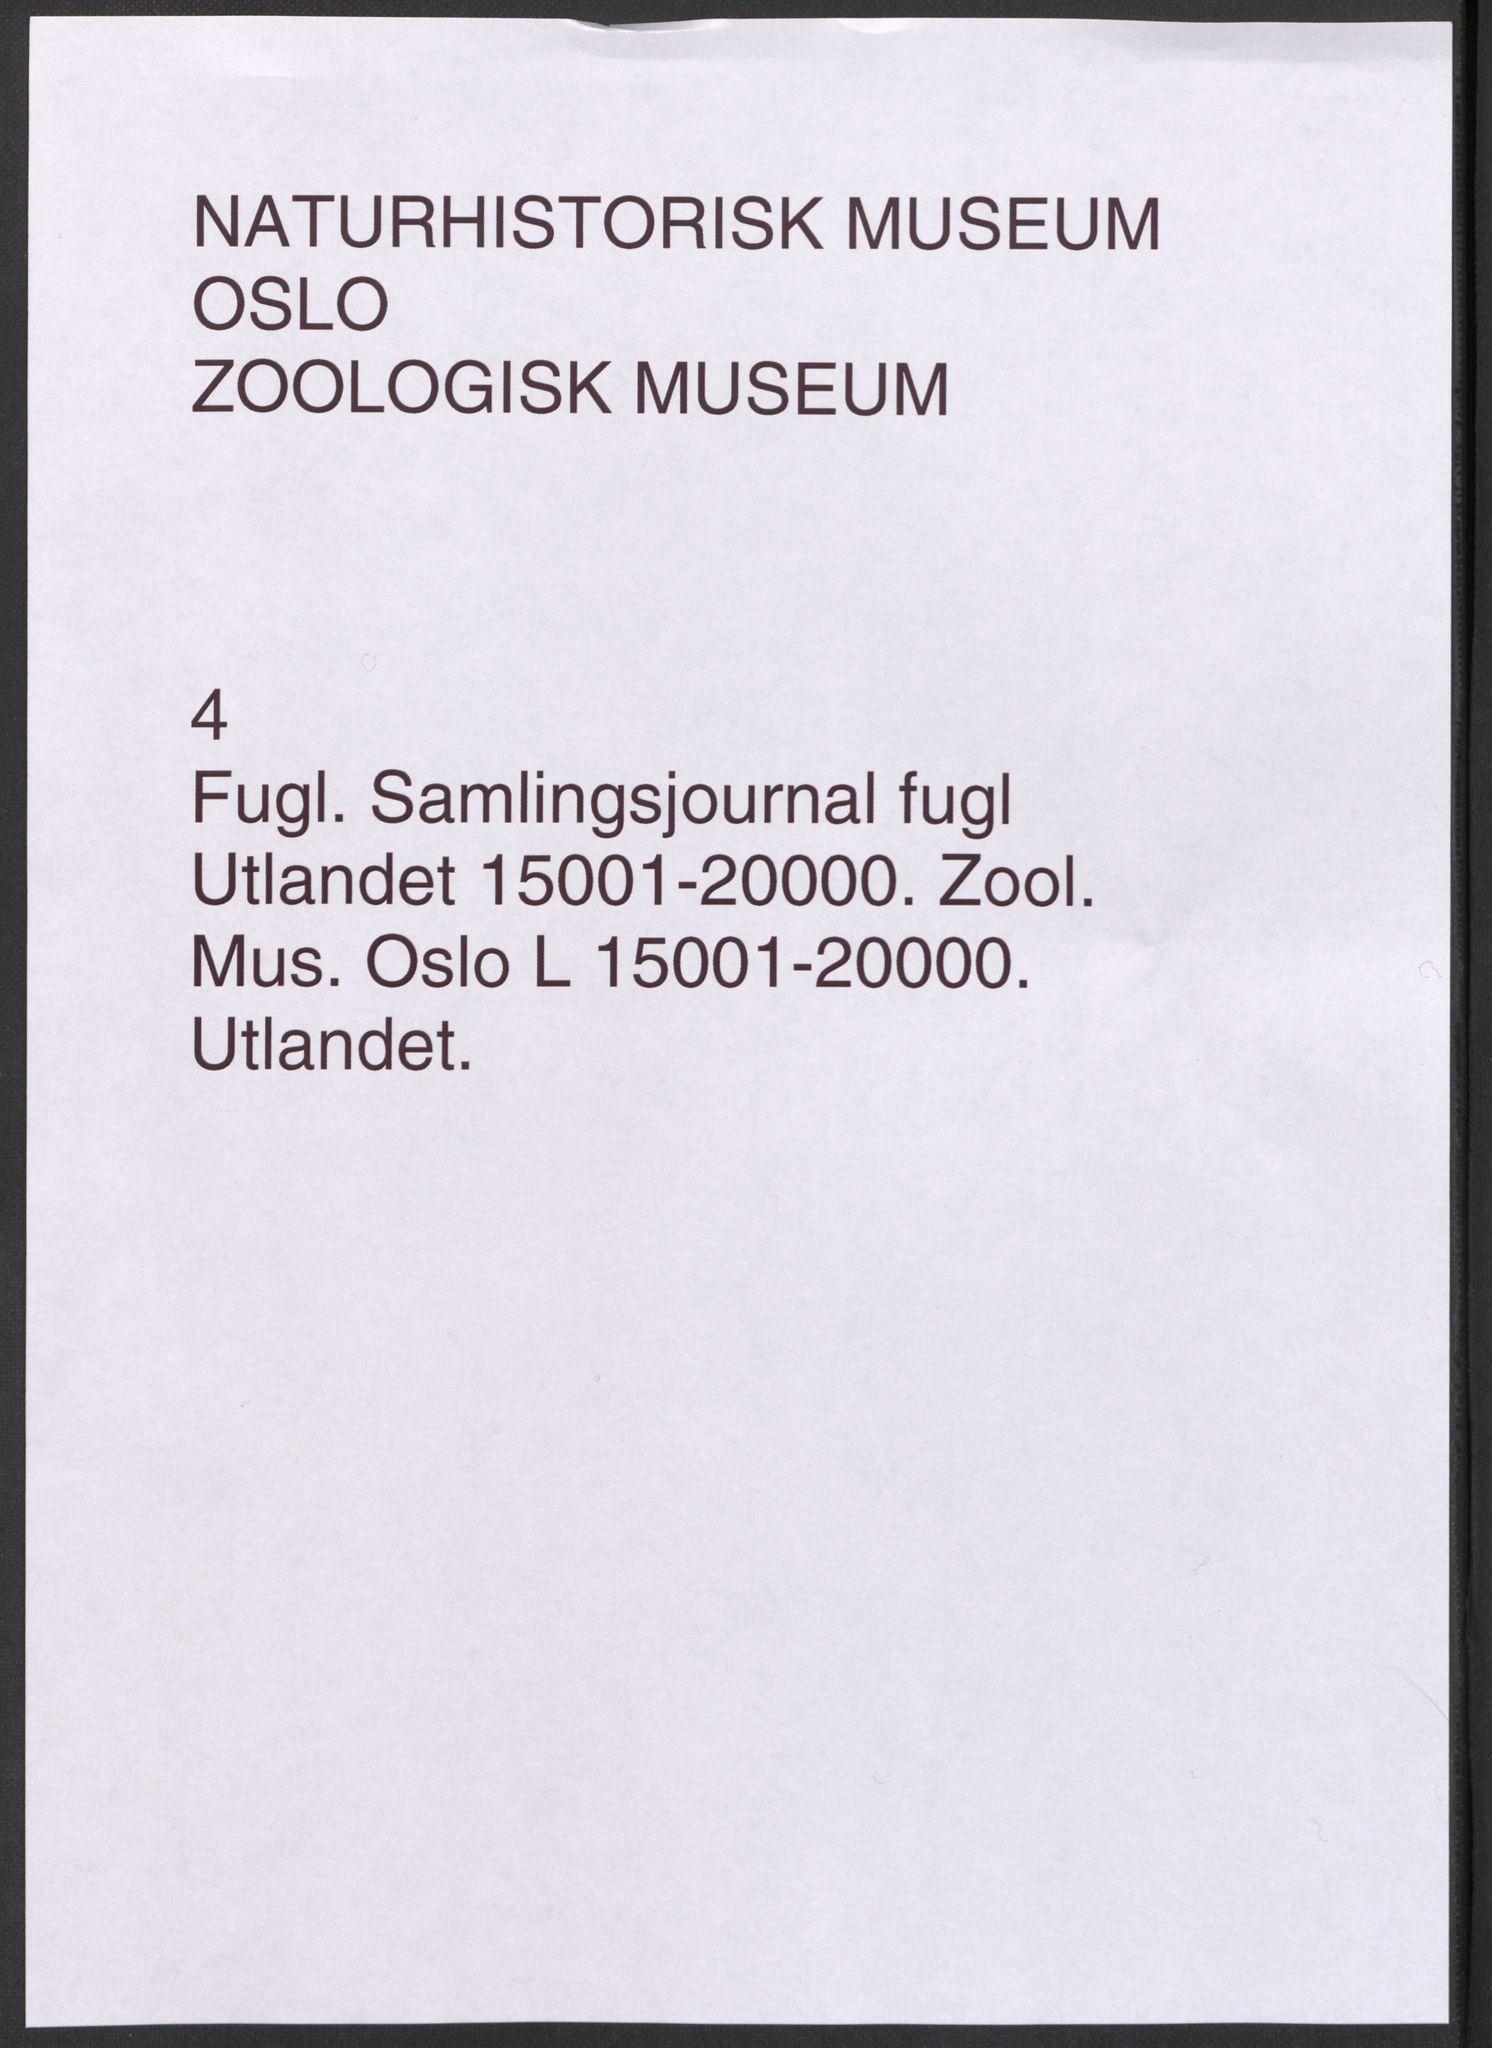 NHMO, Naturhistorisk museum (Oslo), 2: Fugl. Samlingsjournal. Fuglesamlingen, Skinnsamling Utlandet (L), nr. 15001-20000.